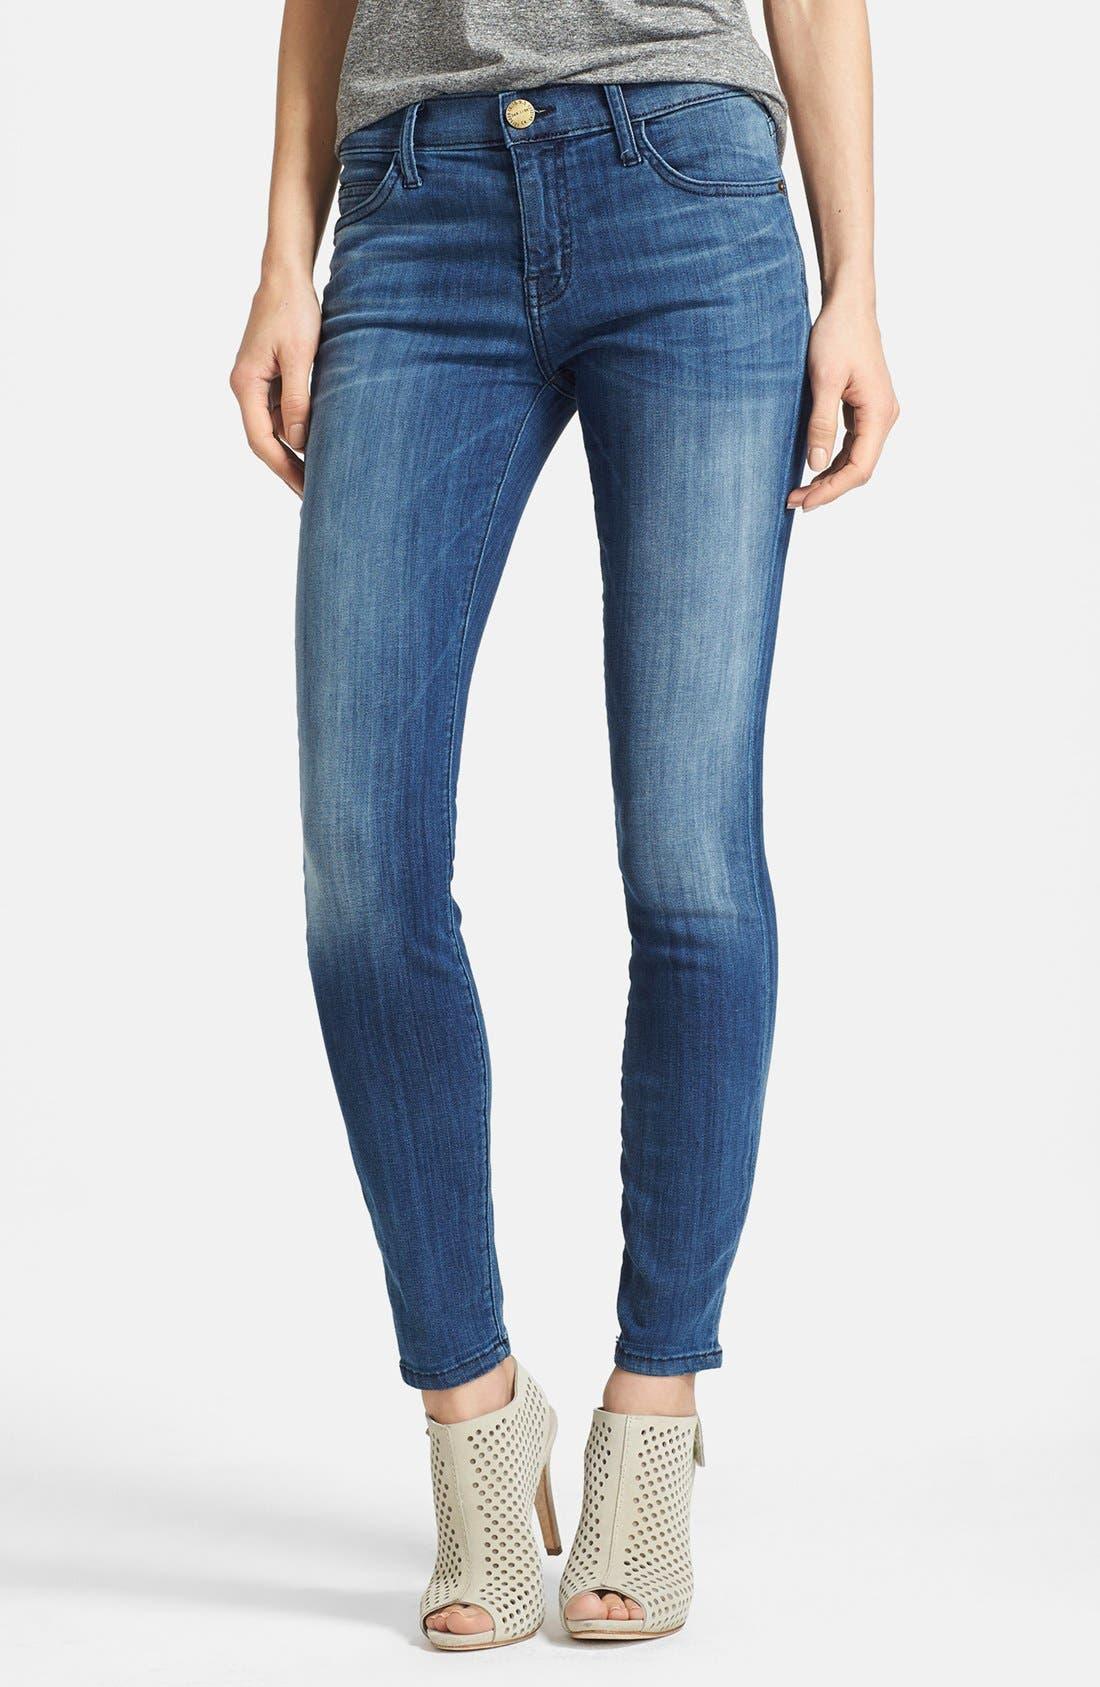 Alternate Image 1 Selected - Current/Elliott 'The Stiletto' Skinny Jeans (Sunfade)